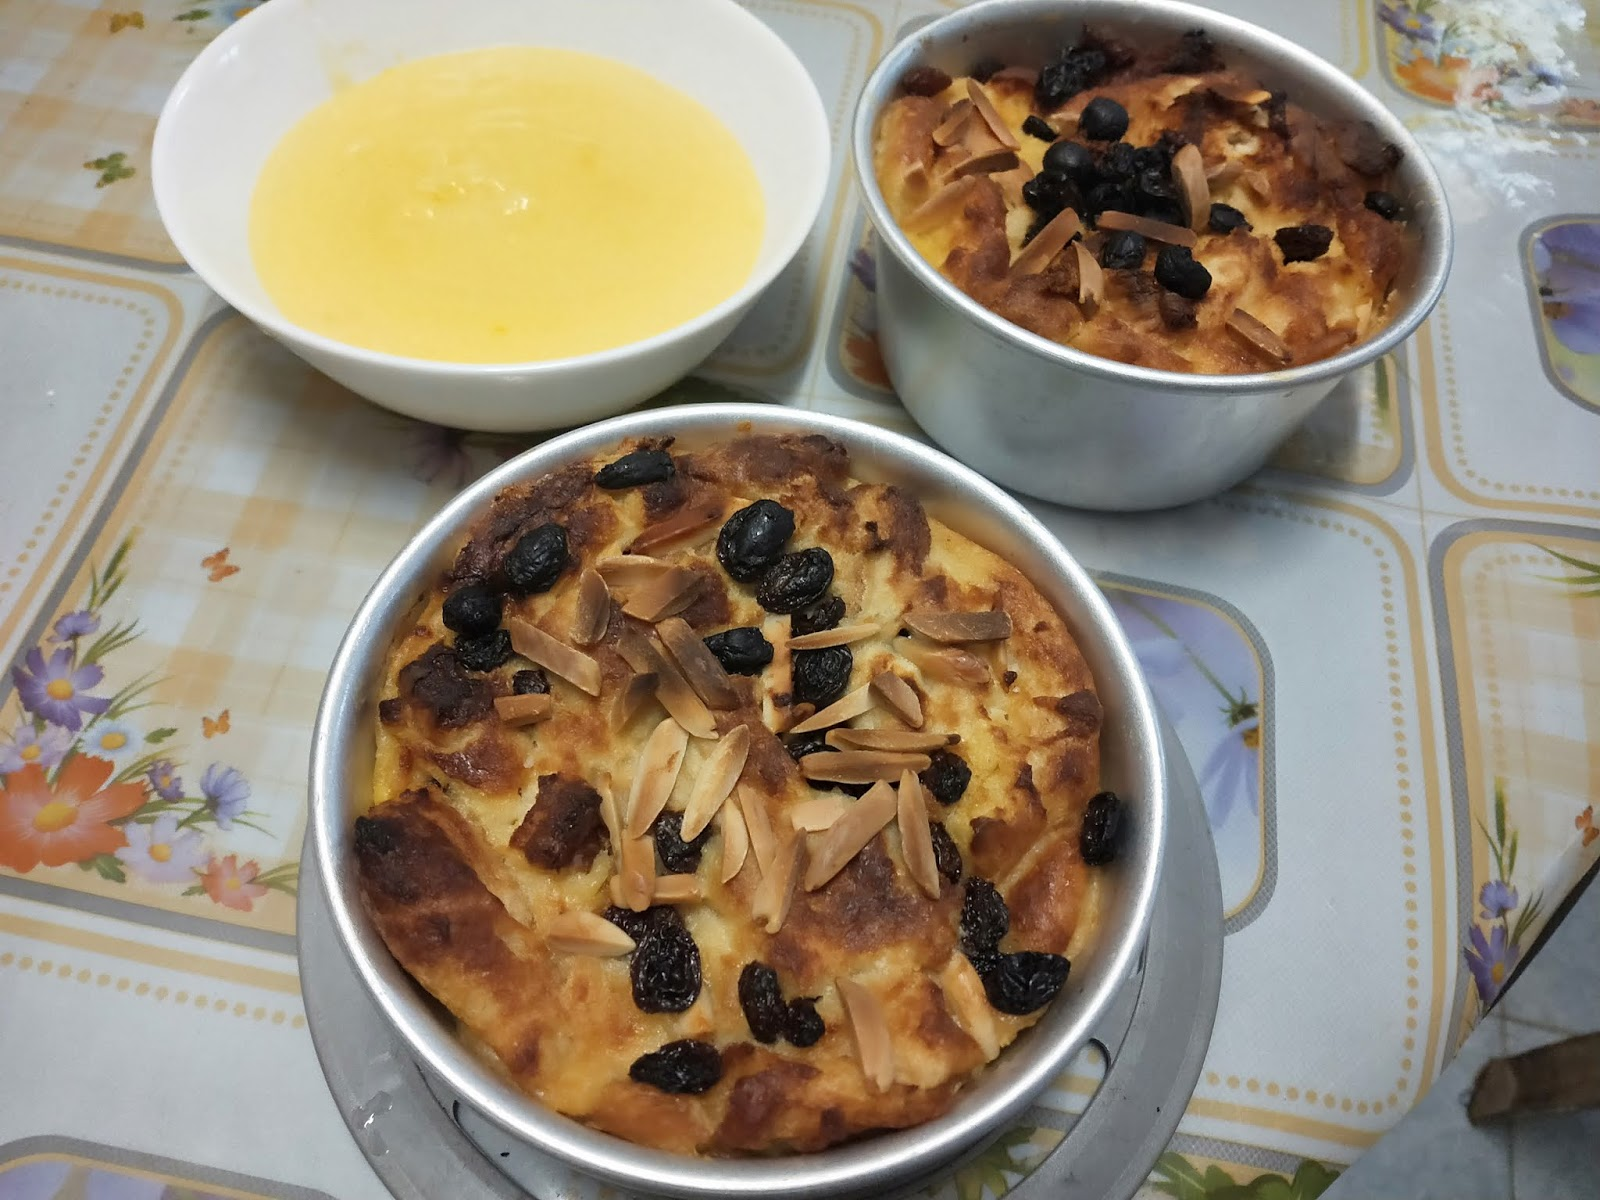 Resepi Puding Roti Air Fryer Sos Kastard Ieyracom